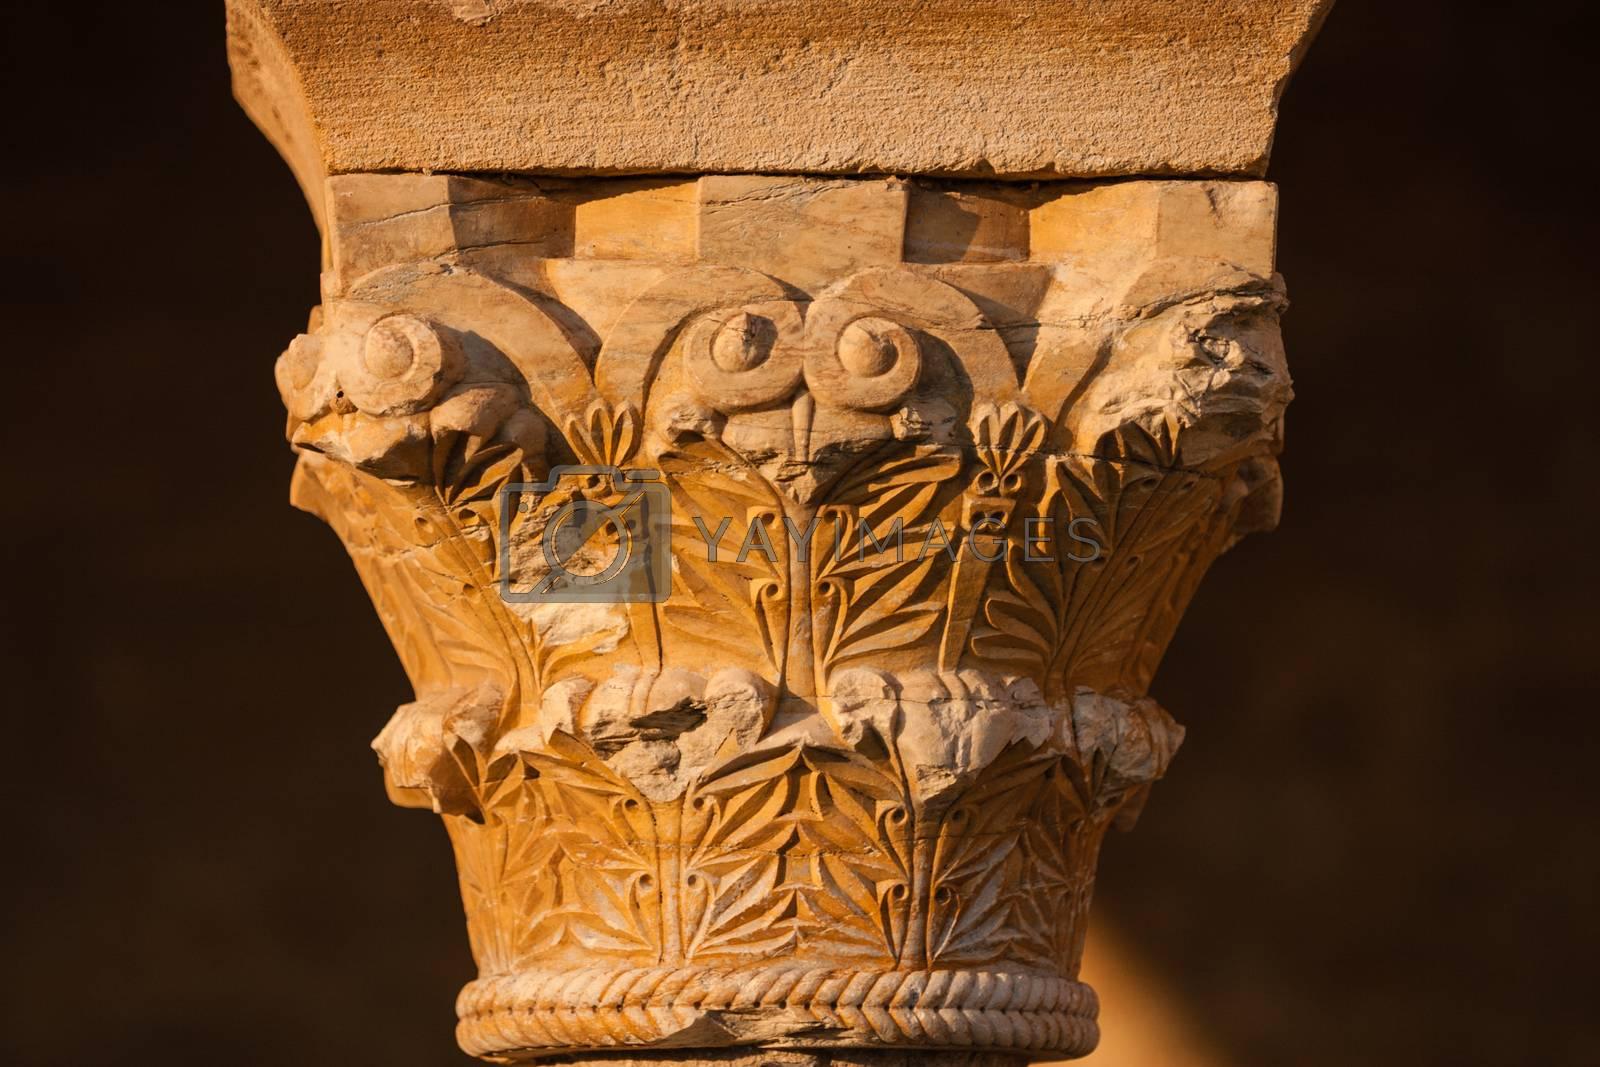 Closeup view of romanesque capital in san miguel de escalada church province of Leon in Spain